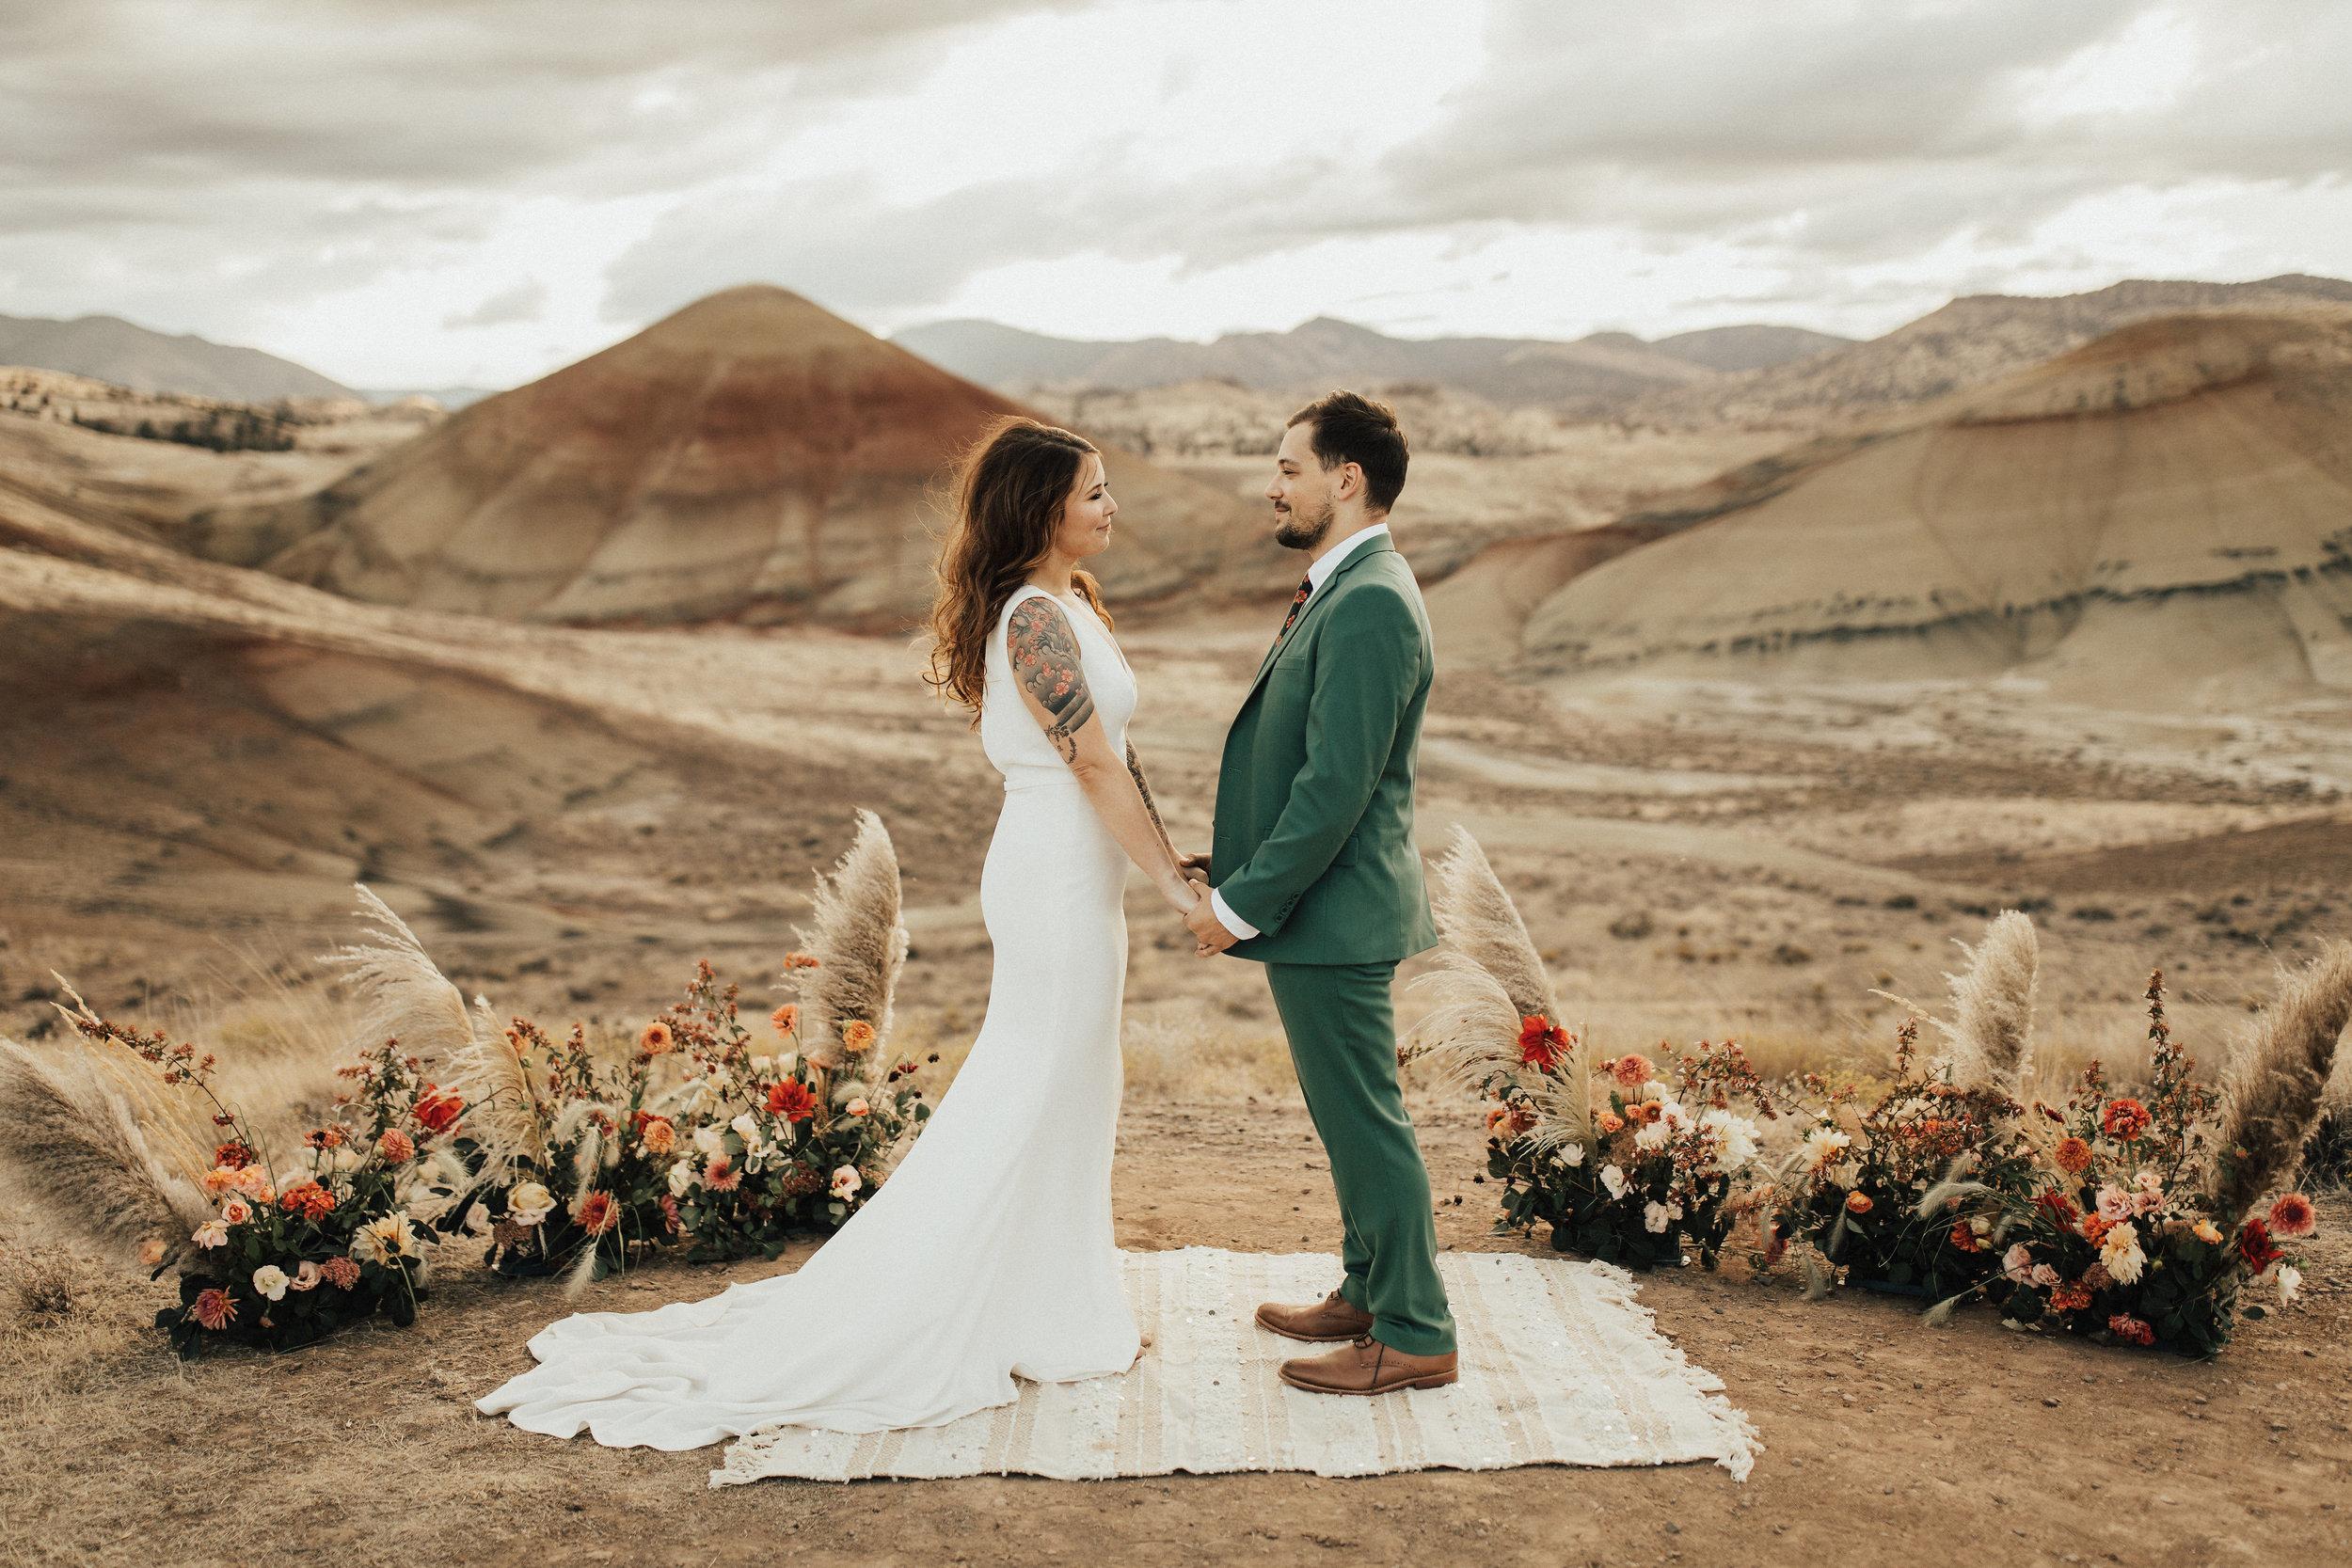 Wedding & Elopement Services -